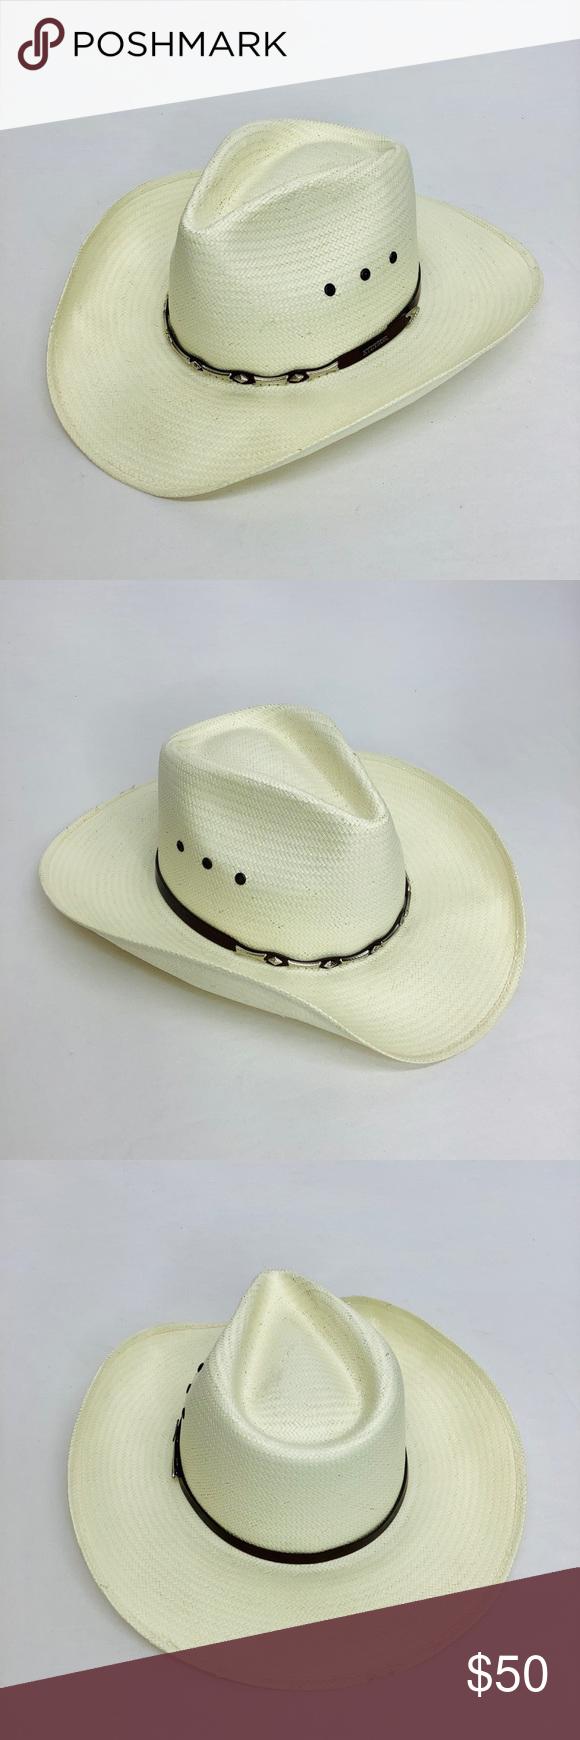 Stallion By Stetson Cowboy Western Hat Size M Stallion By Stetson Cowboy Western Hat Natural Straw Size Medium Stetson Accessor Hat Sizes Cowboy Western Hats